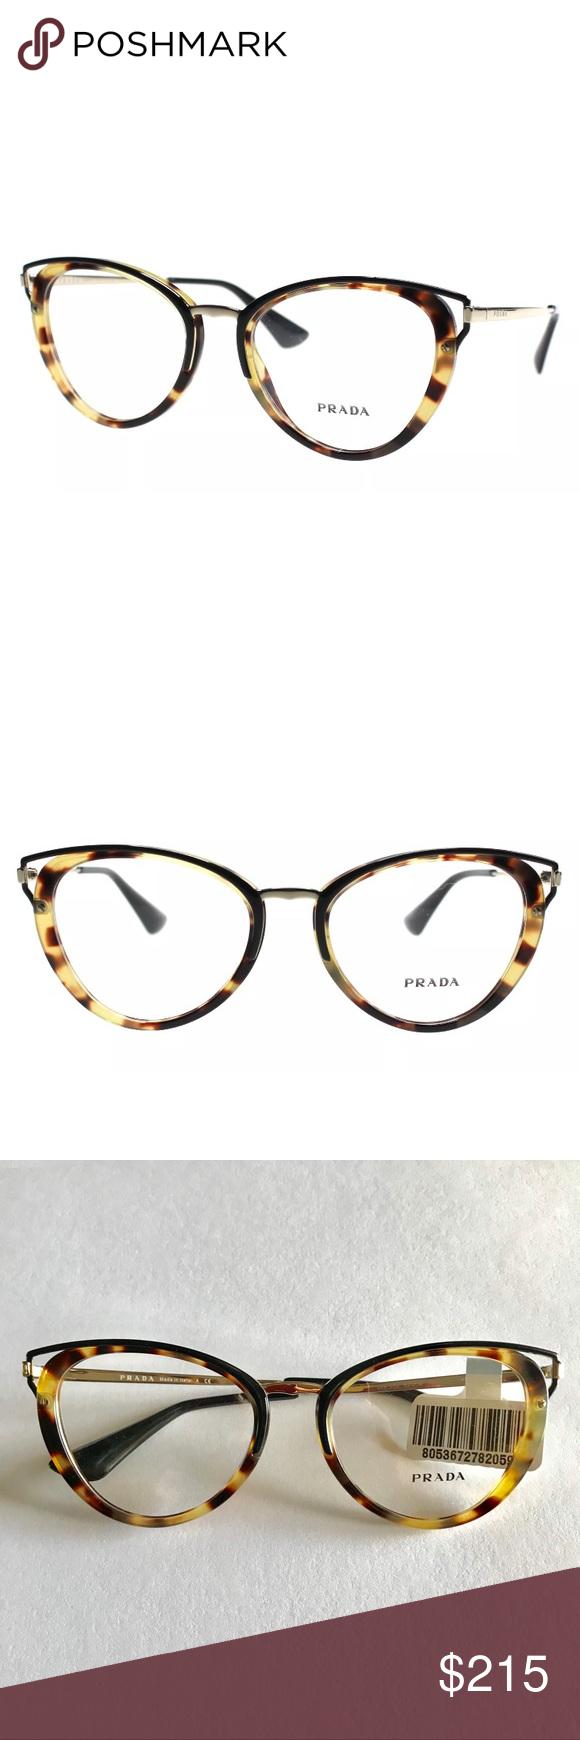 5f5c0adc7b7 Prada women s Glasses PR53U 7S01O1 Medium Havana Beautiful cat eye Prada  Glasses Frames PR53U 7S01O1 Medium Havana 52mm Womens Retail  400 Comes  with case ...